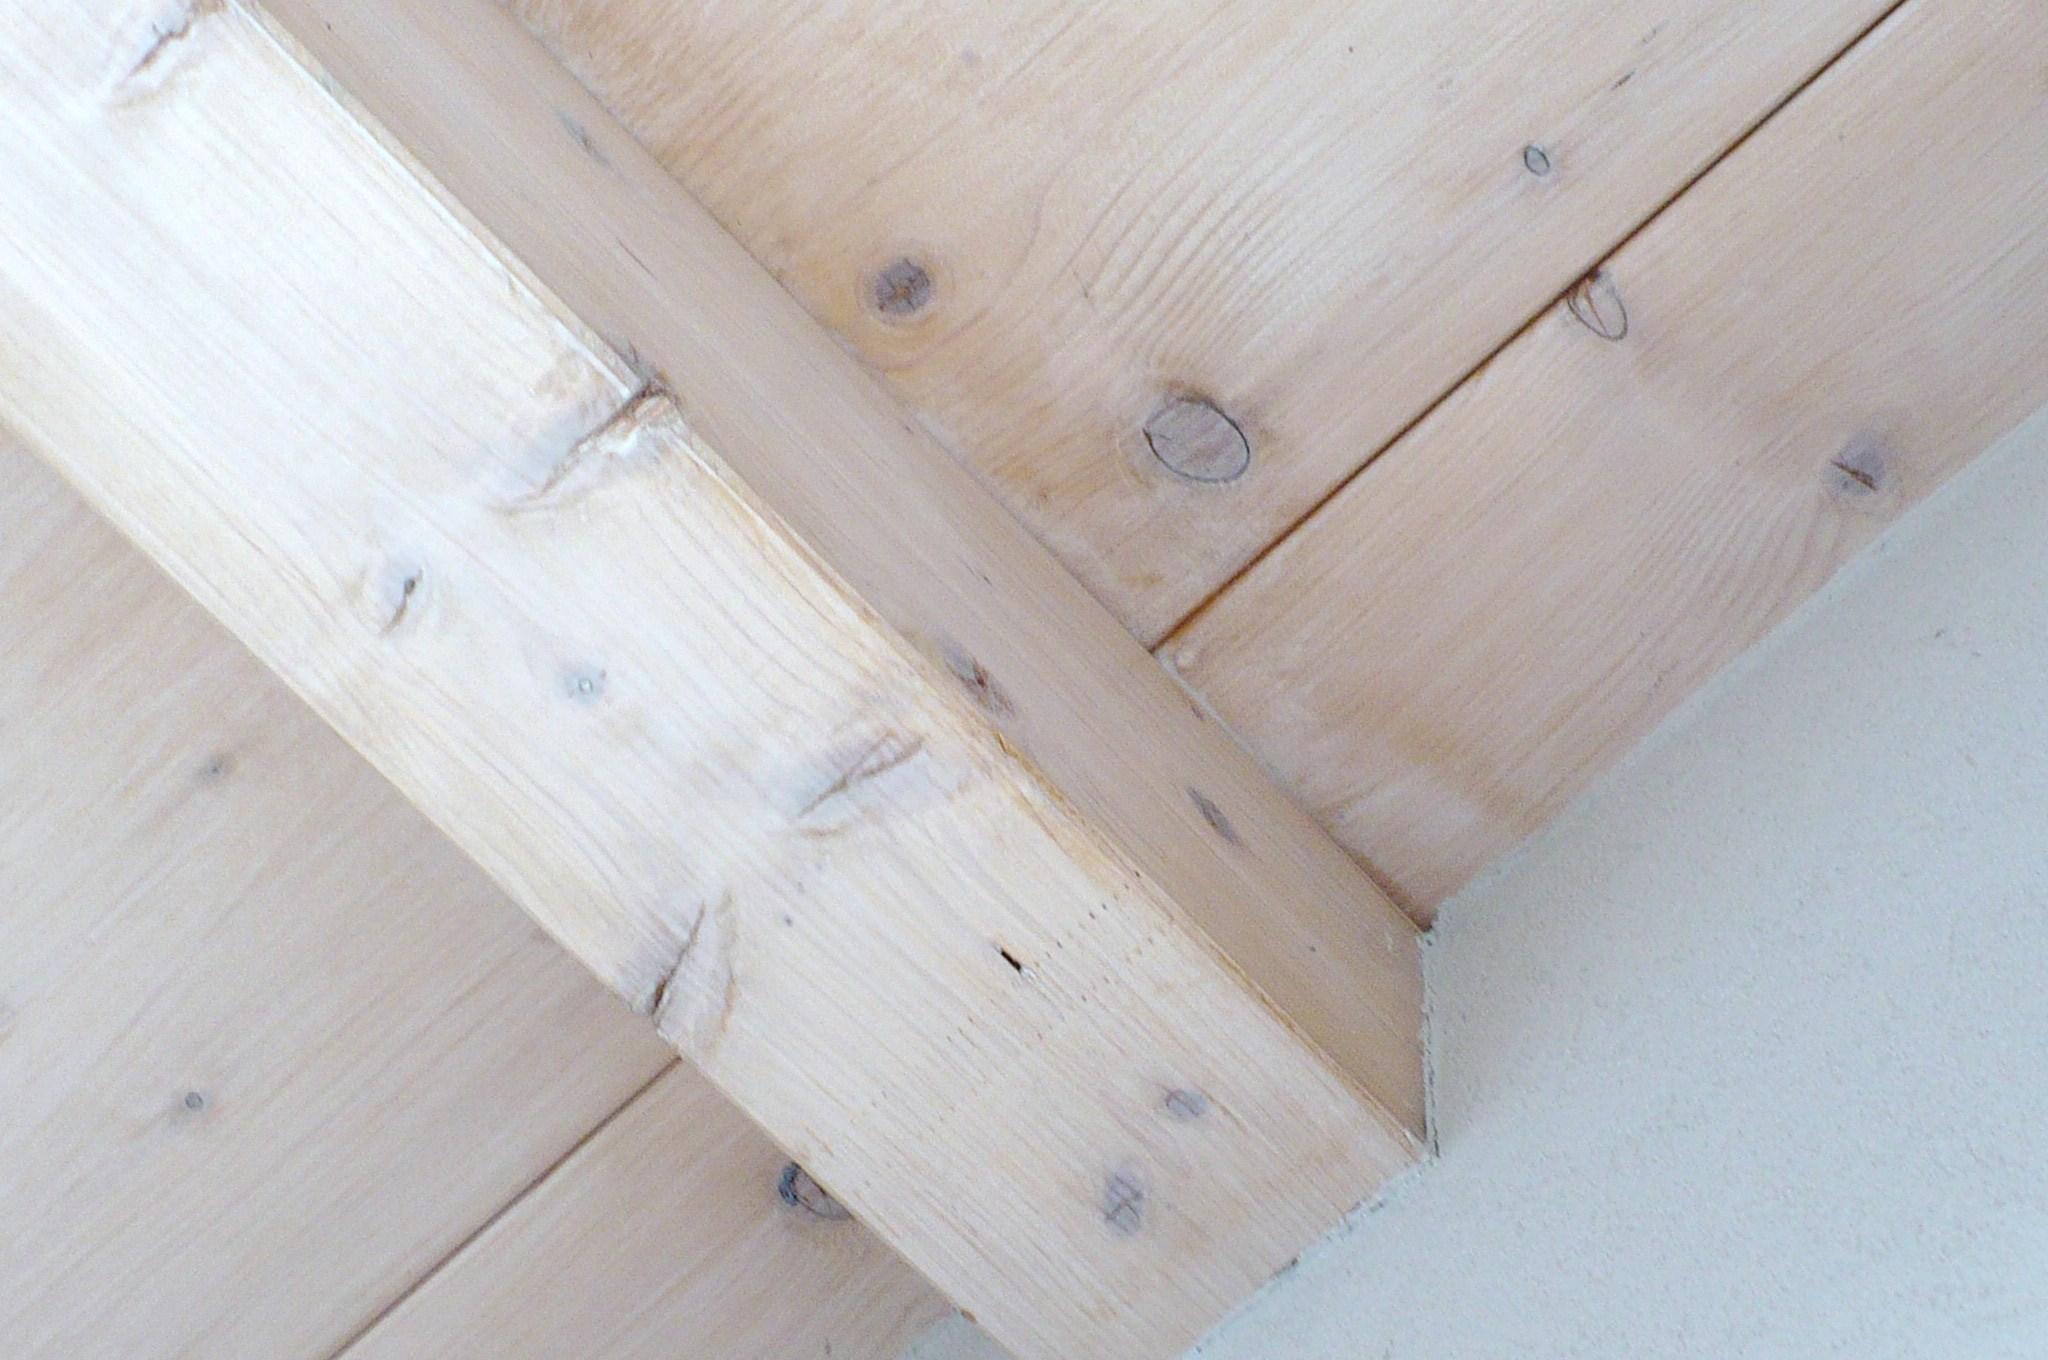 Tetto in legno bianco tetto in legno bianco with tetto in - Tetto in legno bianco ...